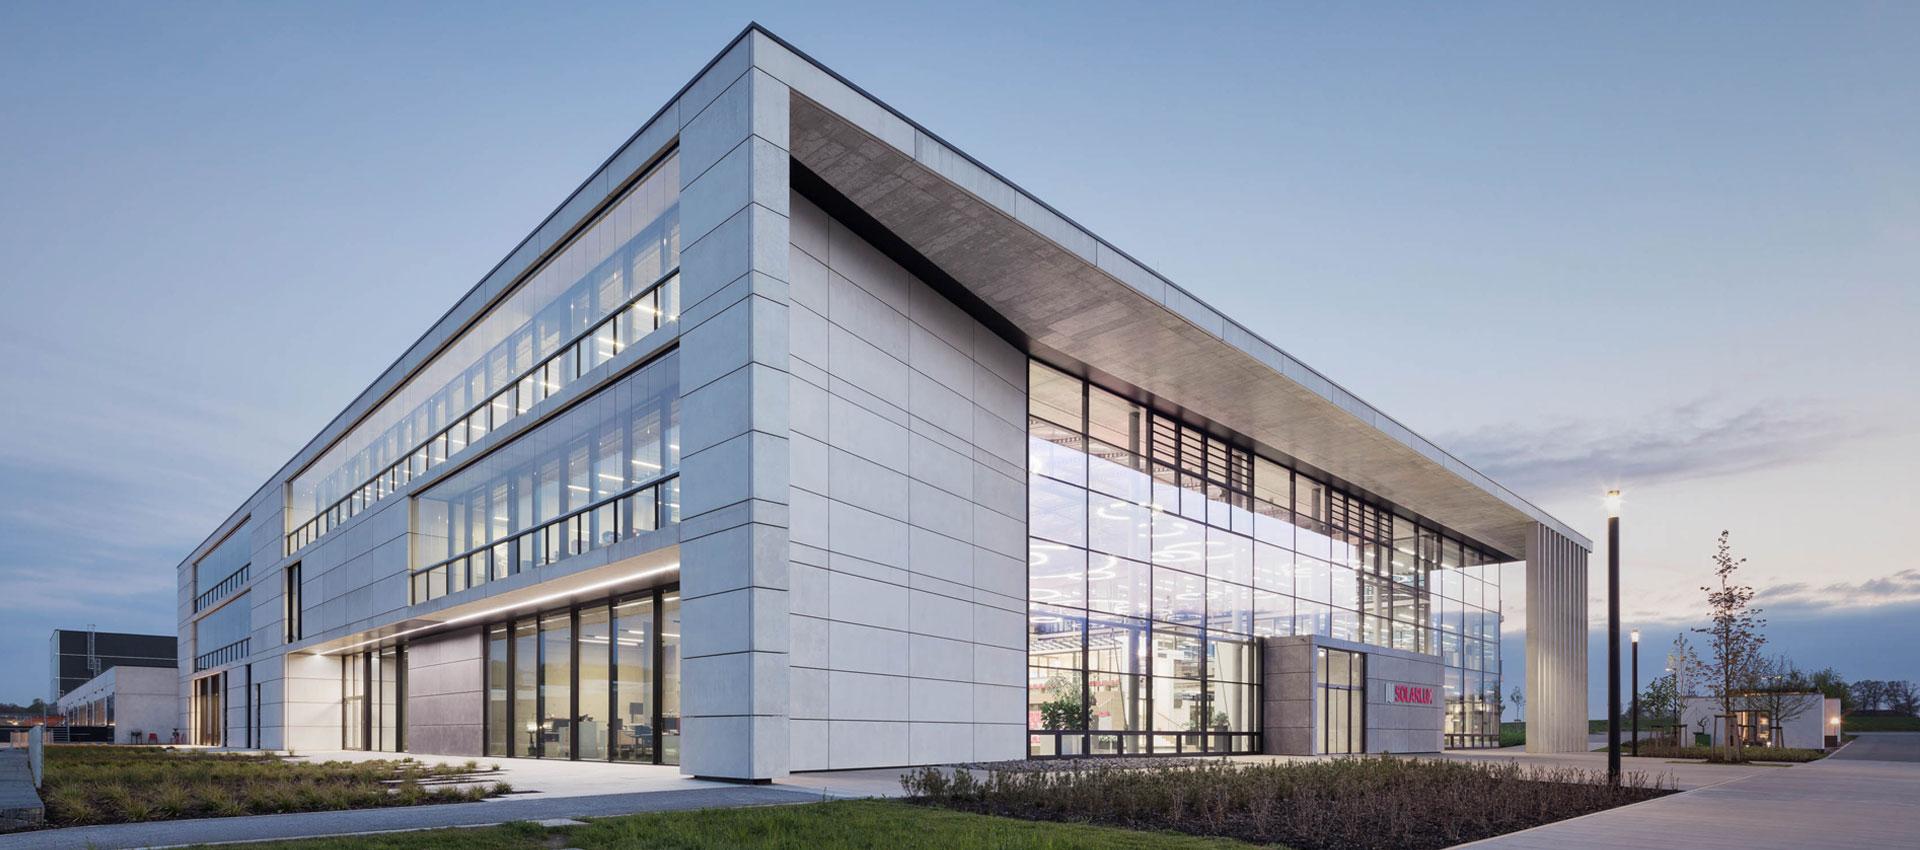 Solarlux Campus Melle